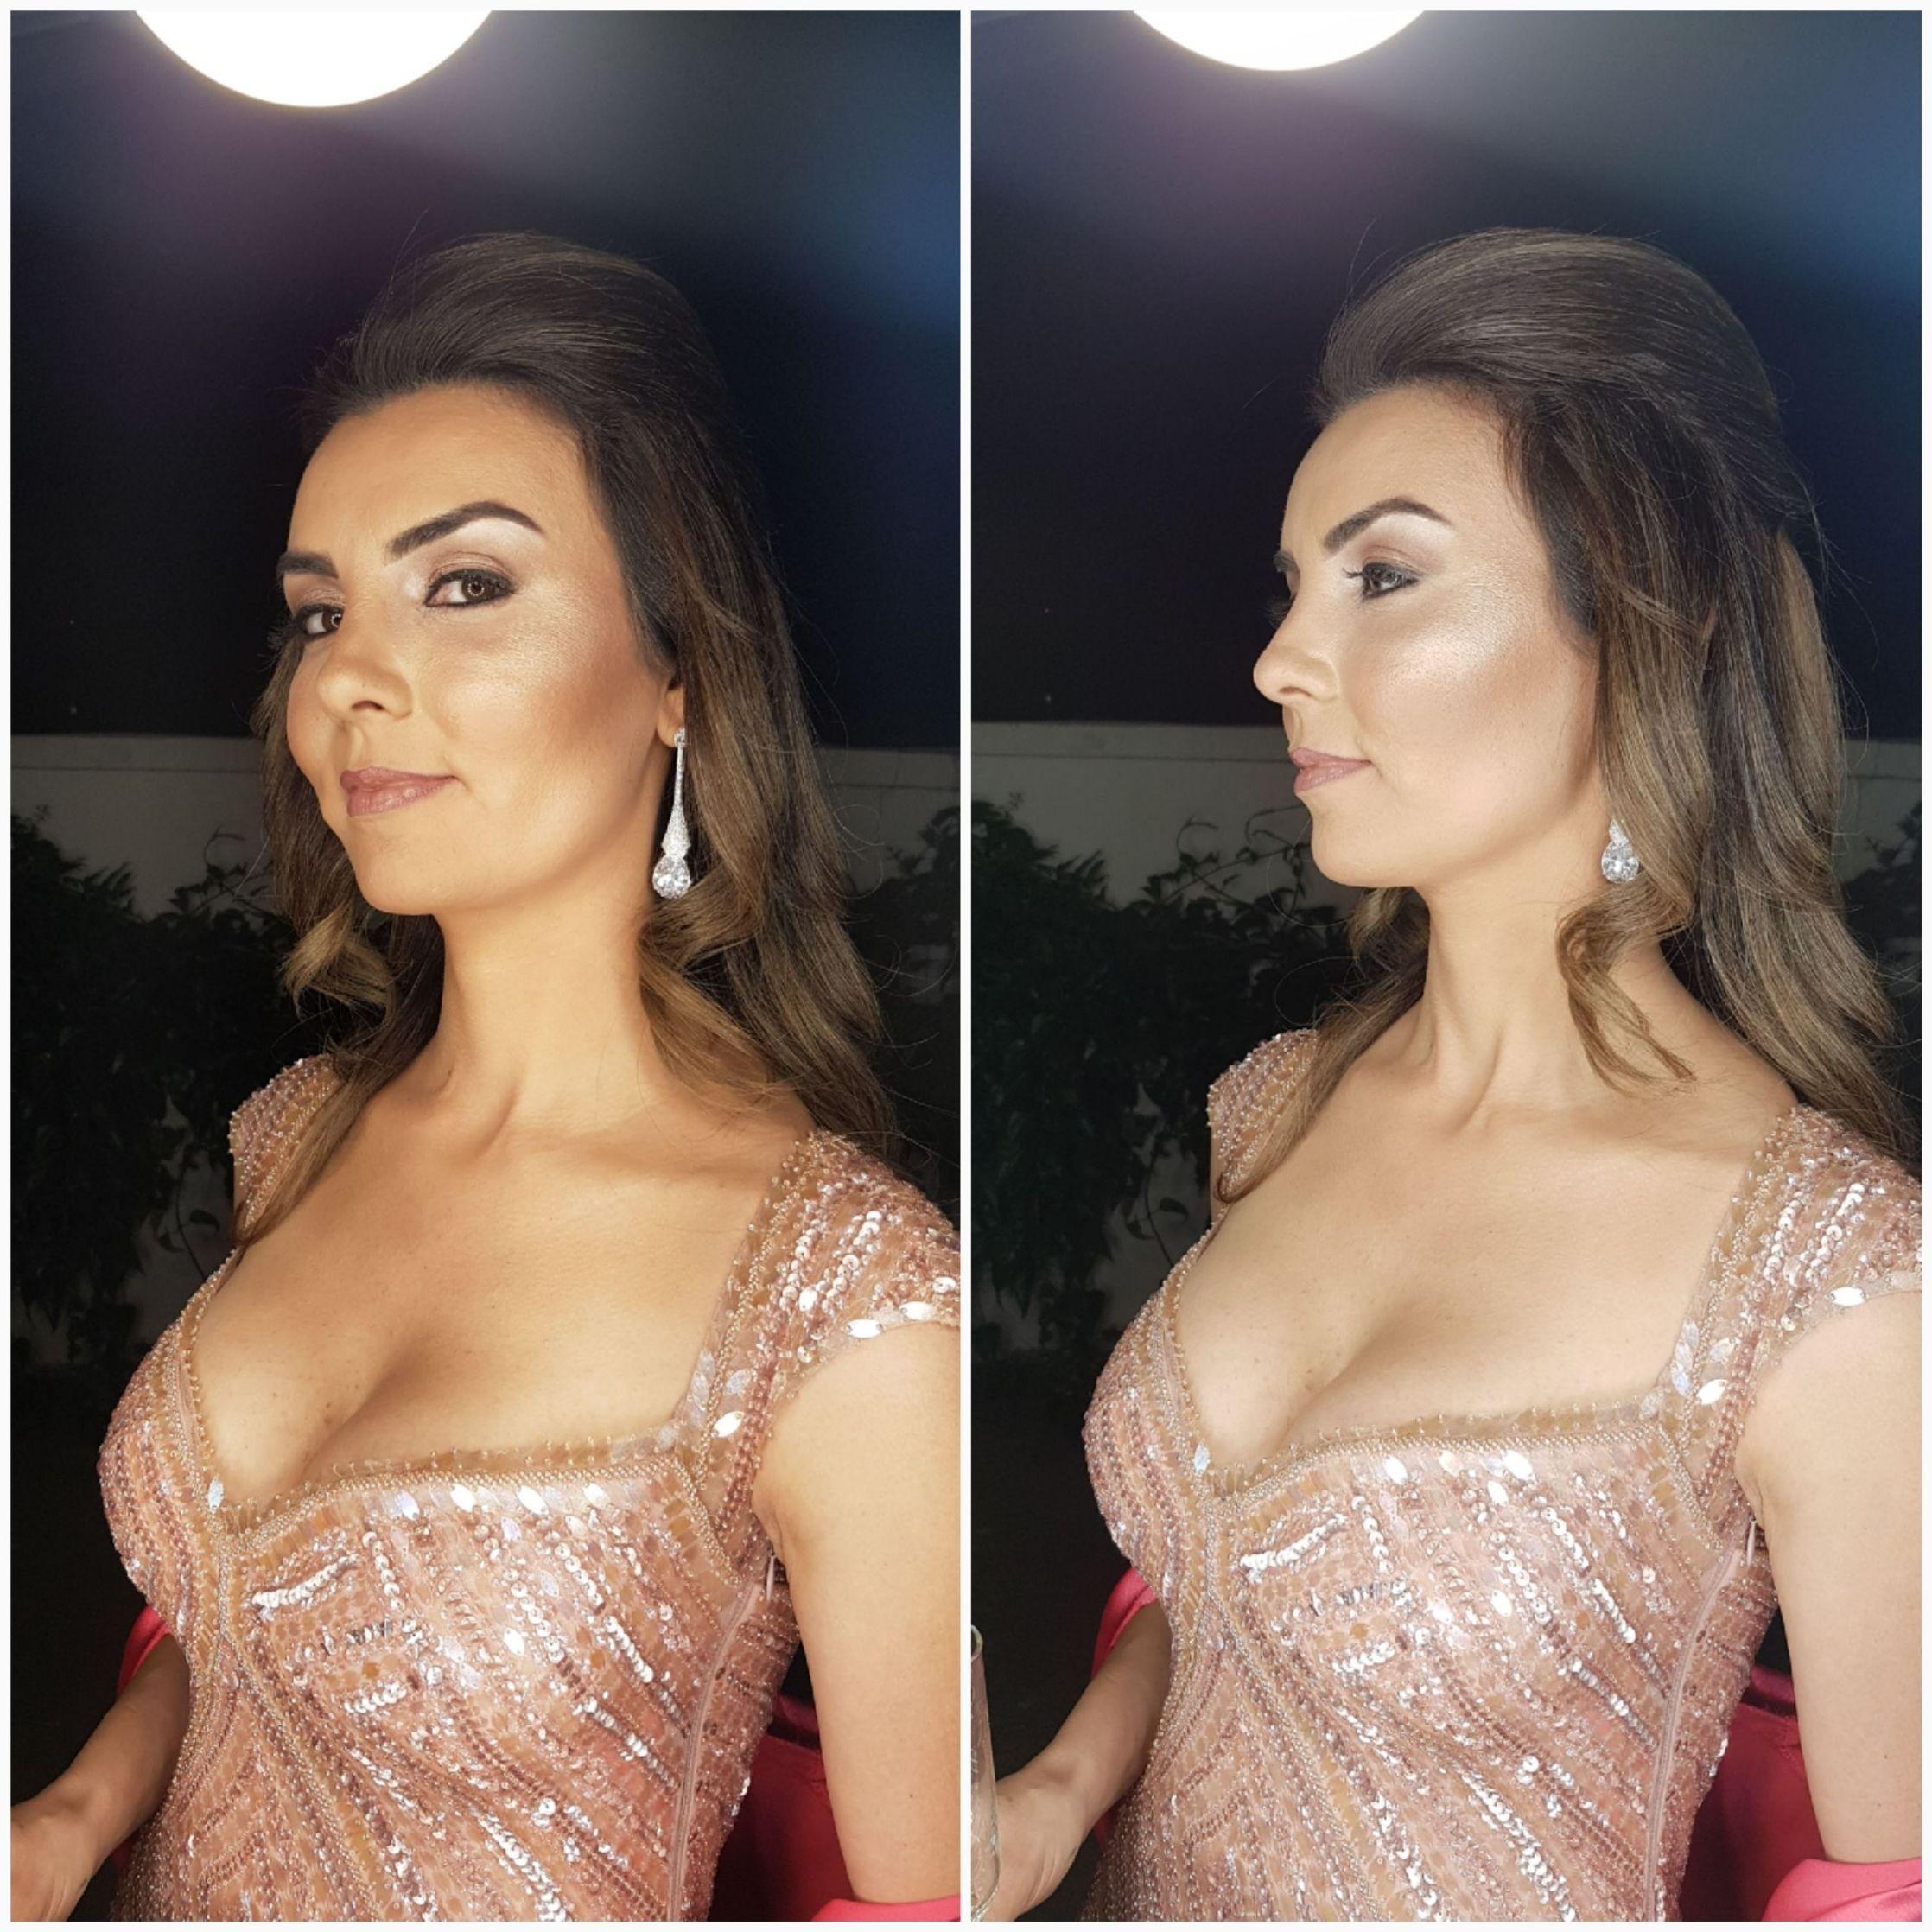 #barbaraganem #maquiadora #visagismo #makeup #beautyartist #beautiful #makeupforever #mac #vult #dior #boticario #marykay #sisley #sigma #kryolan #tracta #pausaparafeminice #hudabeauty #anastasiabervelyhills #artdeco #bourjoisparis #chanel #clarins #clinique #givenchy #lorealparis #lancome #revlon #yvessaintlaurent #shiseido #olay #covergirl #oriflame #maybelline #avon #natura #becca maquiagem maquiador(a) stylist / visagista